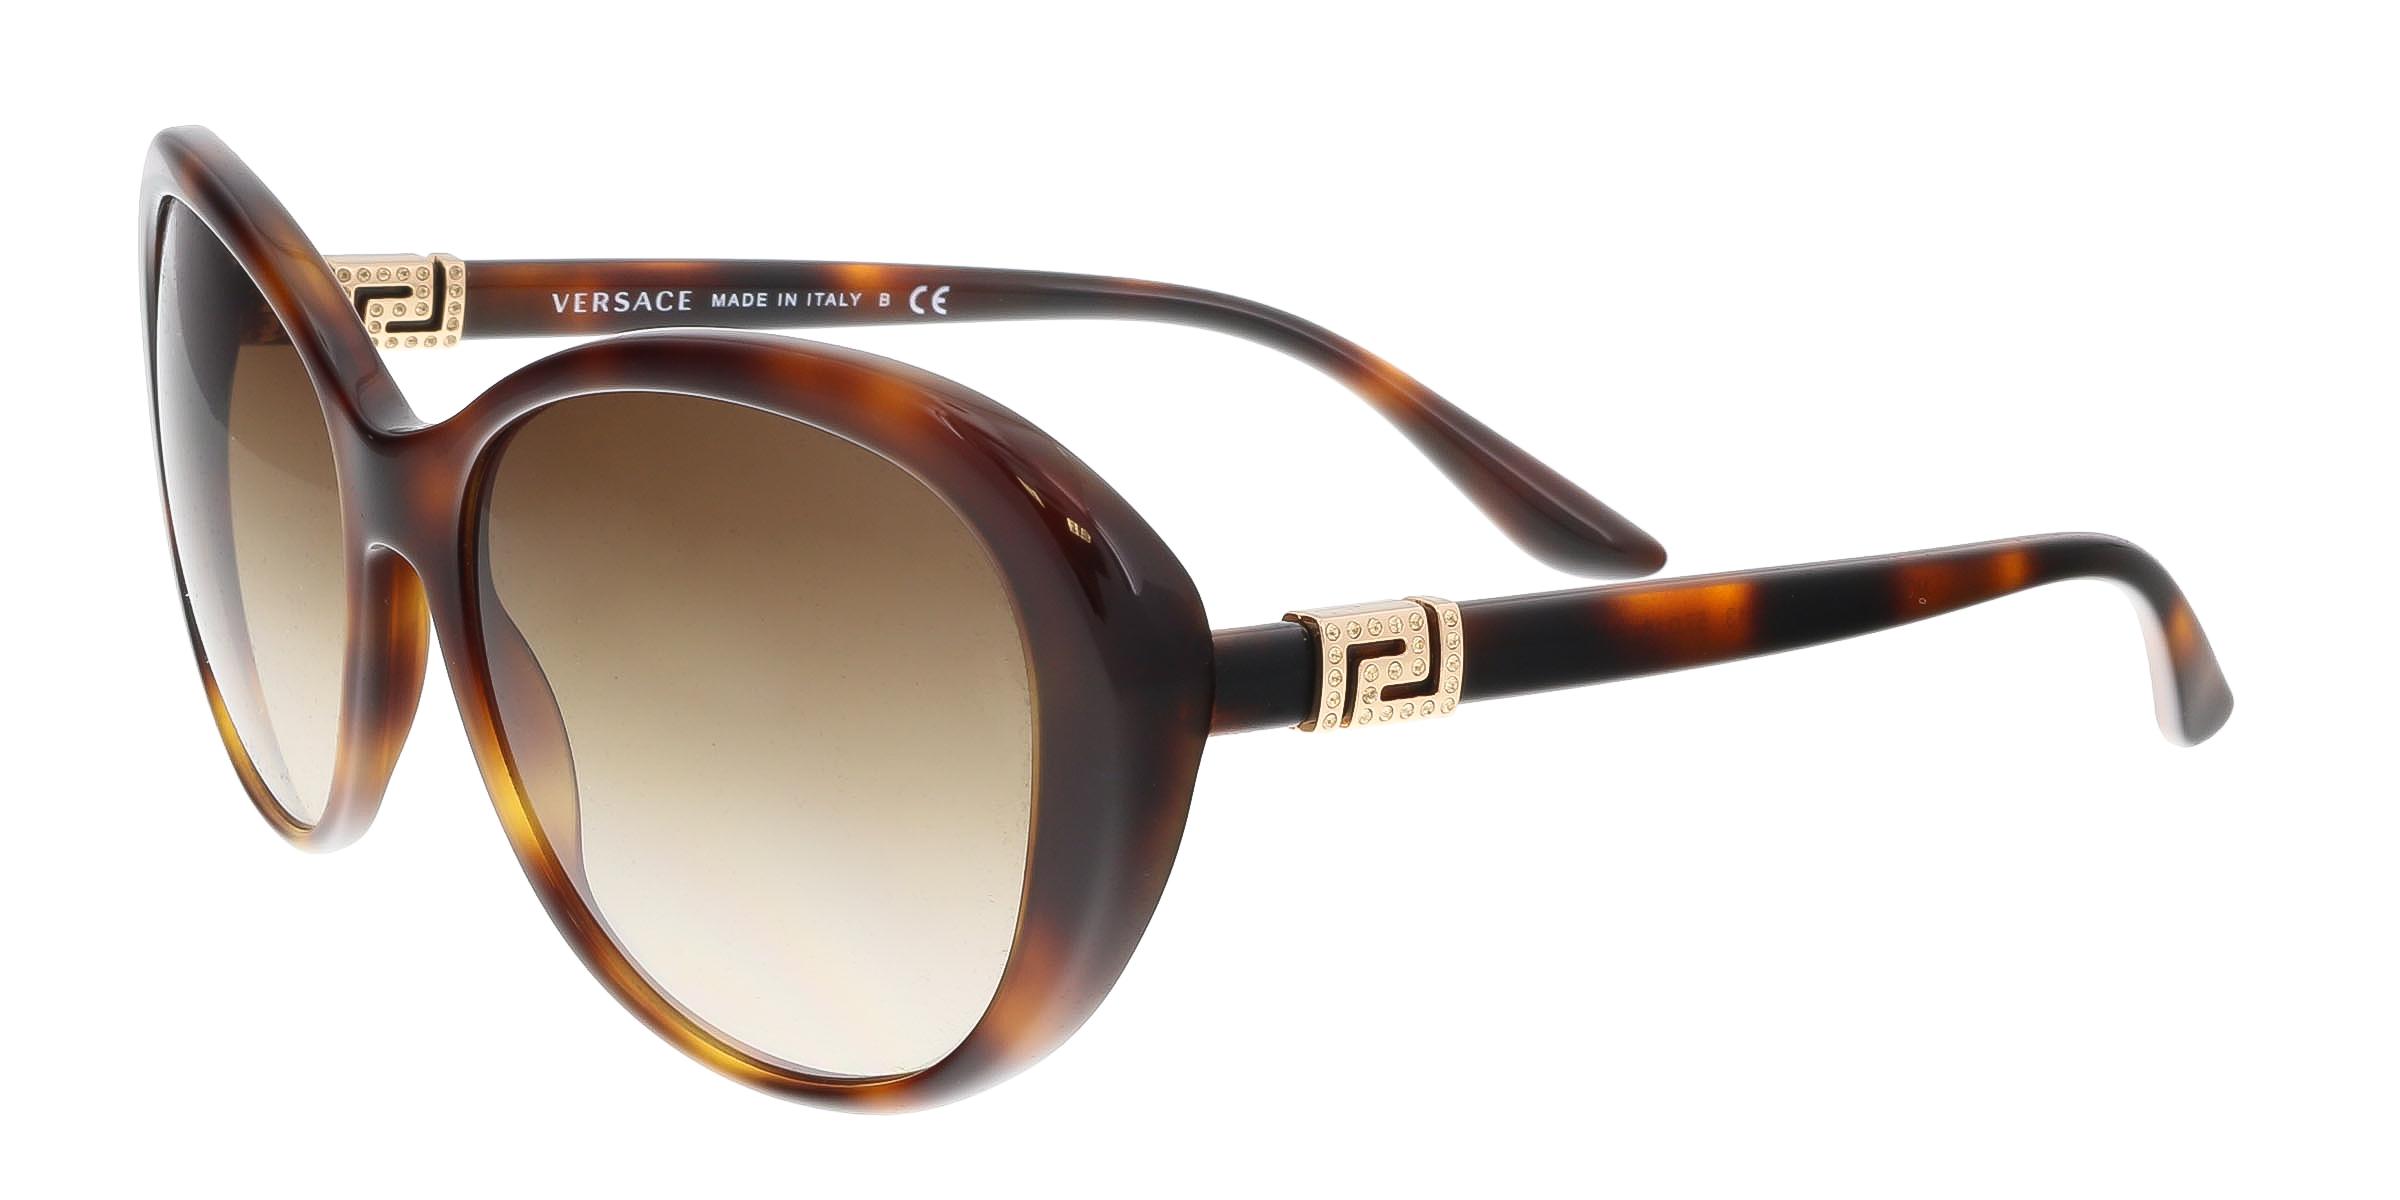 Versace VE4324B 521713 Havana Oval  Greek Key Chic Sunglasses